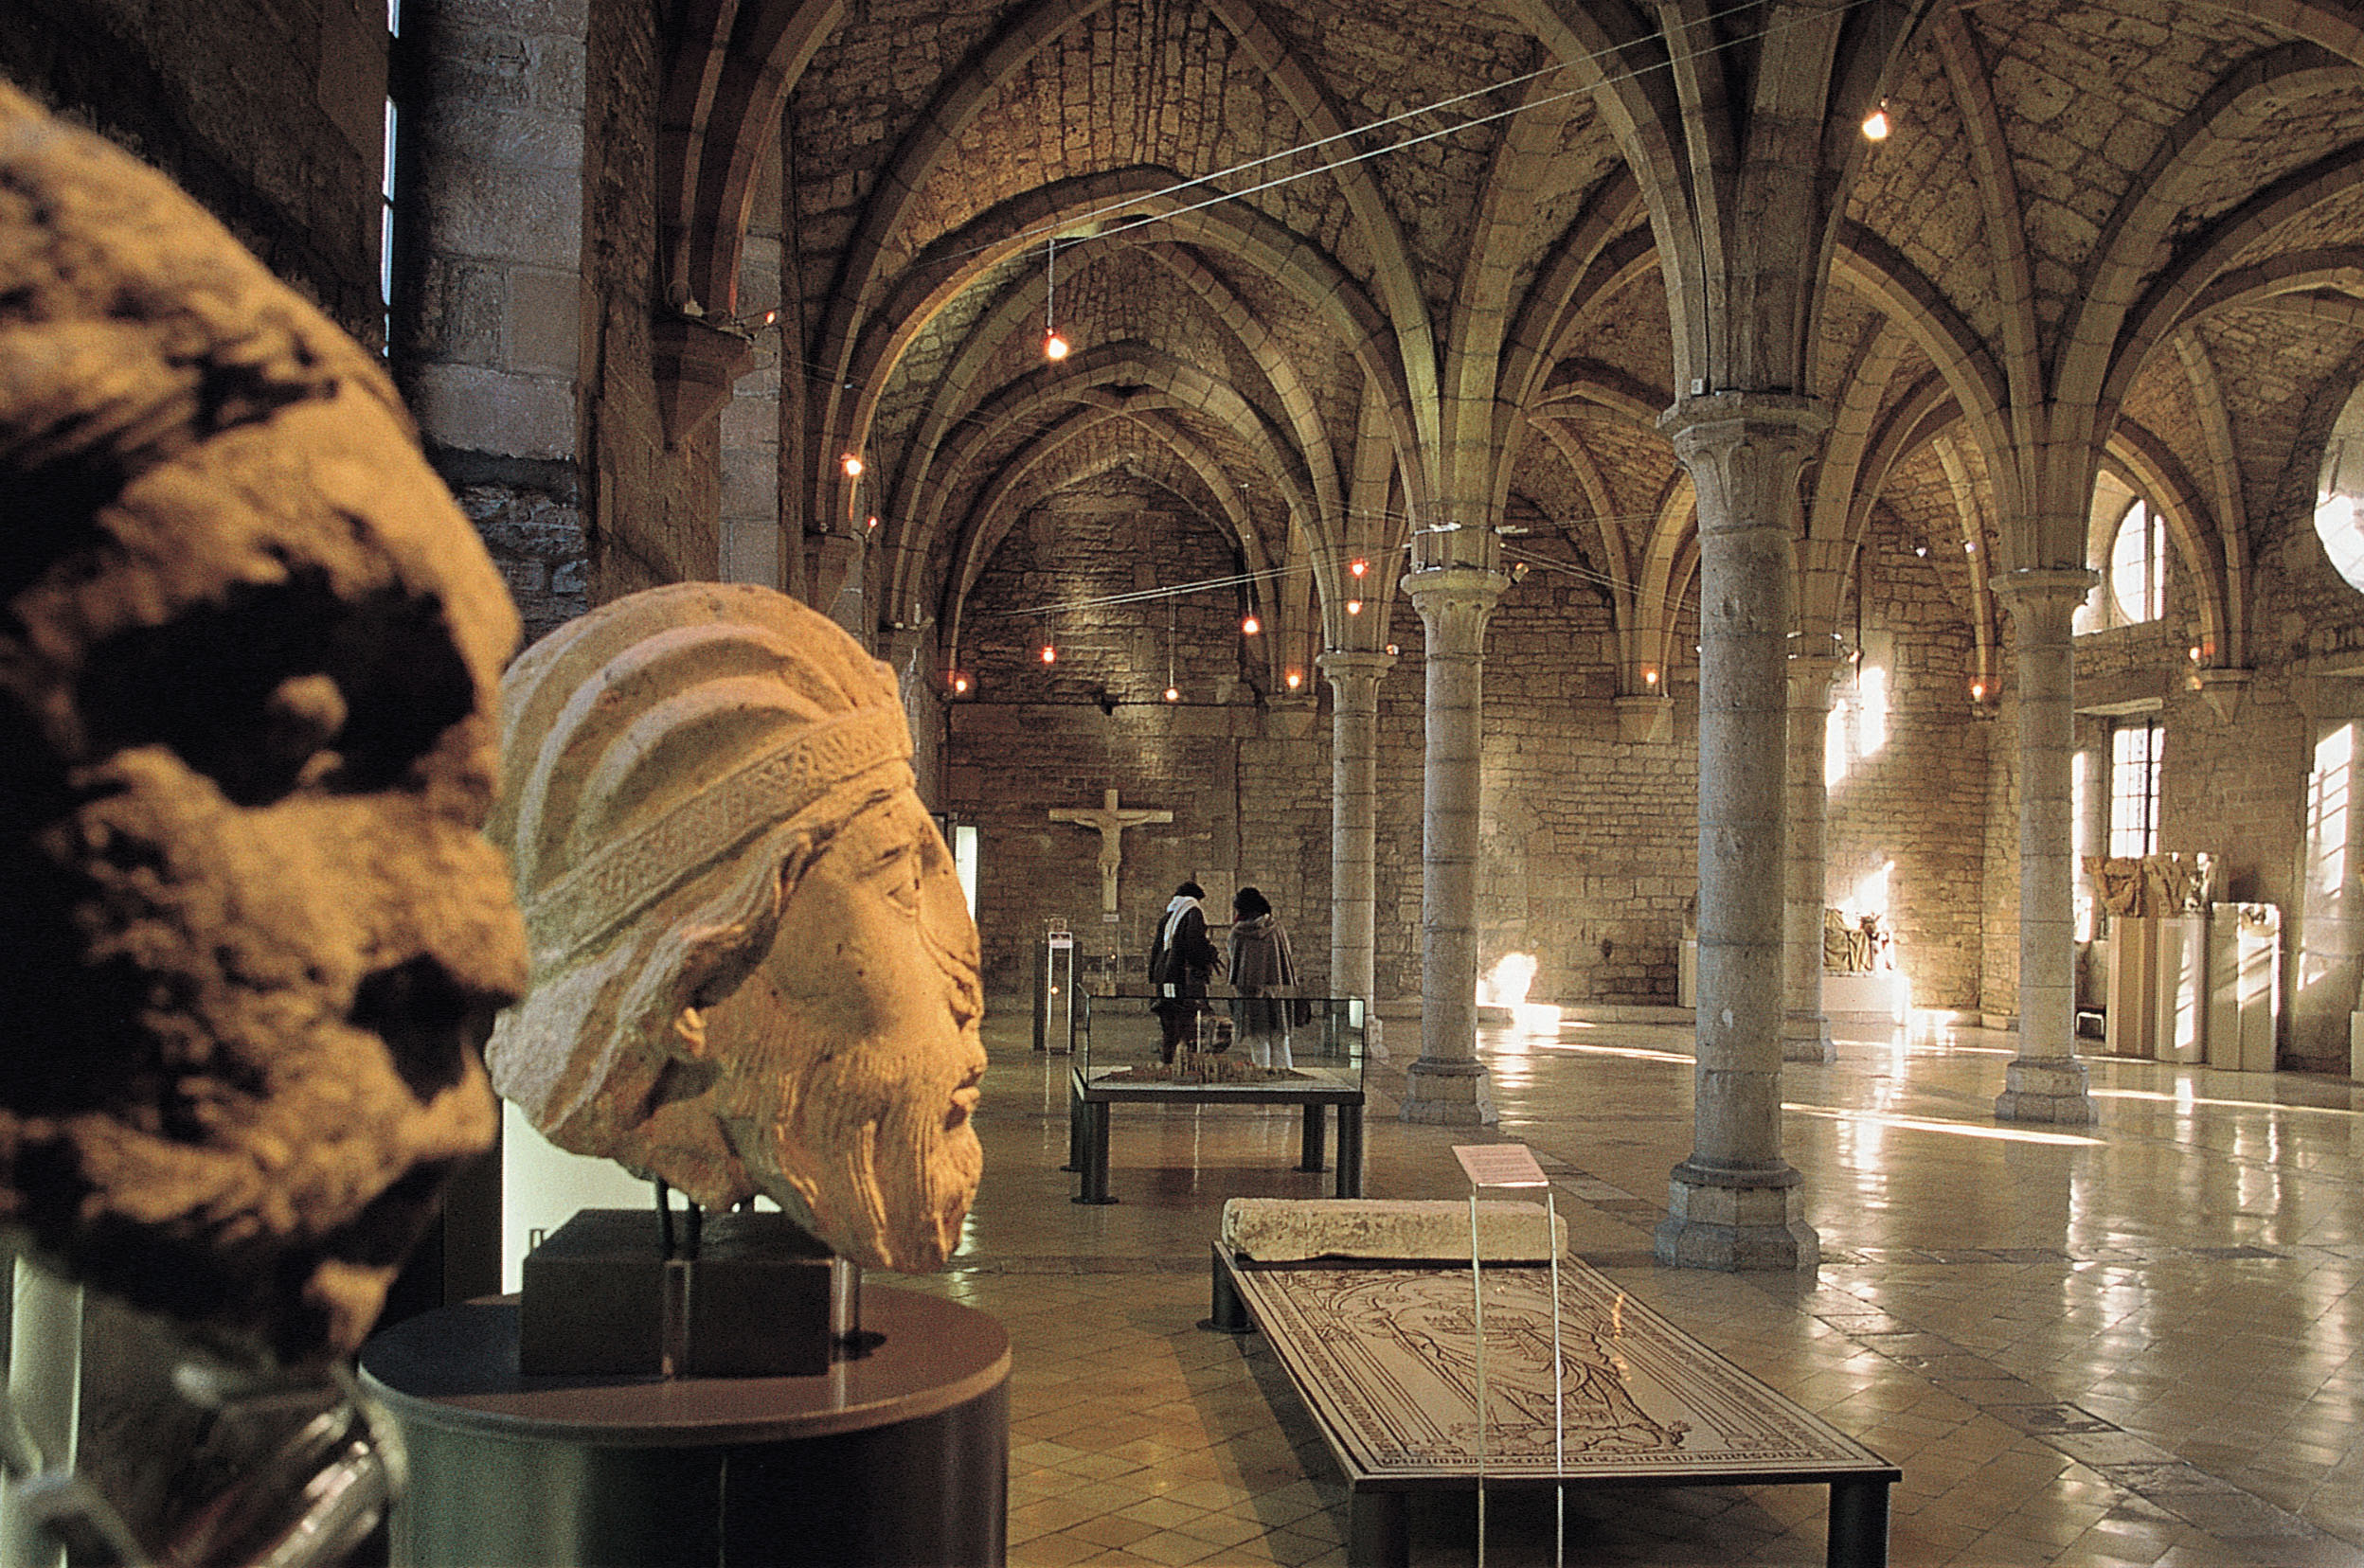 MUSEE ARCHEOLOGIQUE DE DIJON